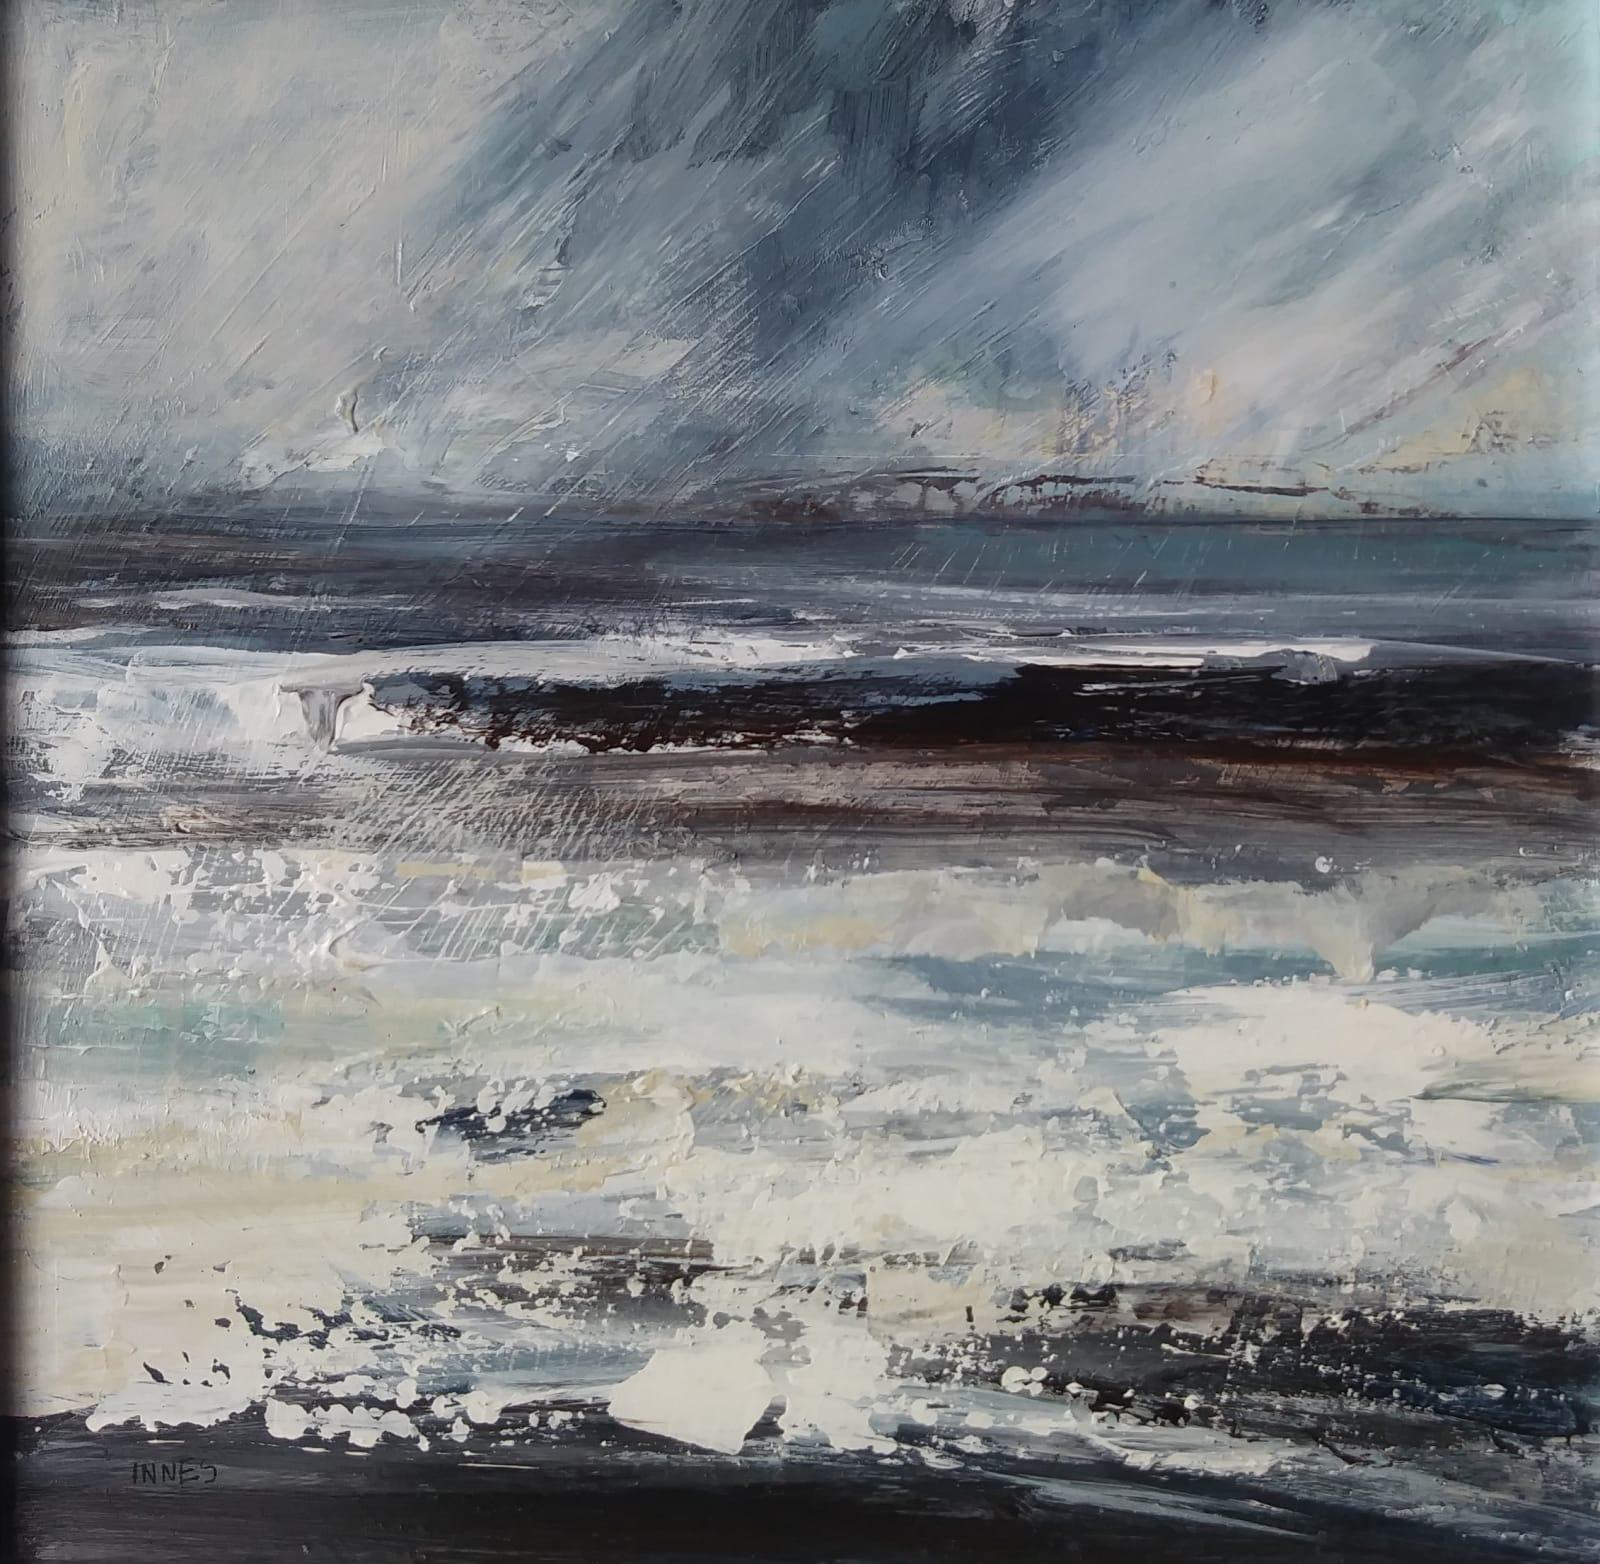 Frances Innes, Wild and Restless Coast, 2021